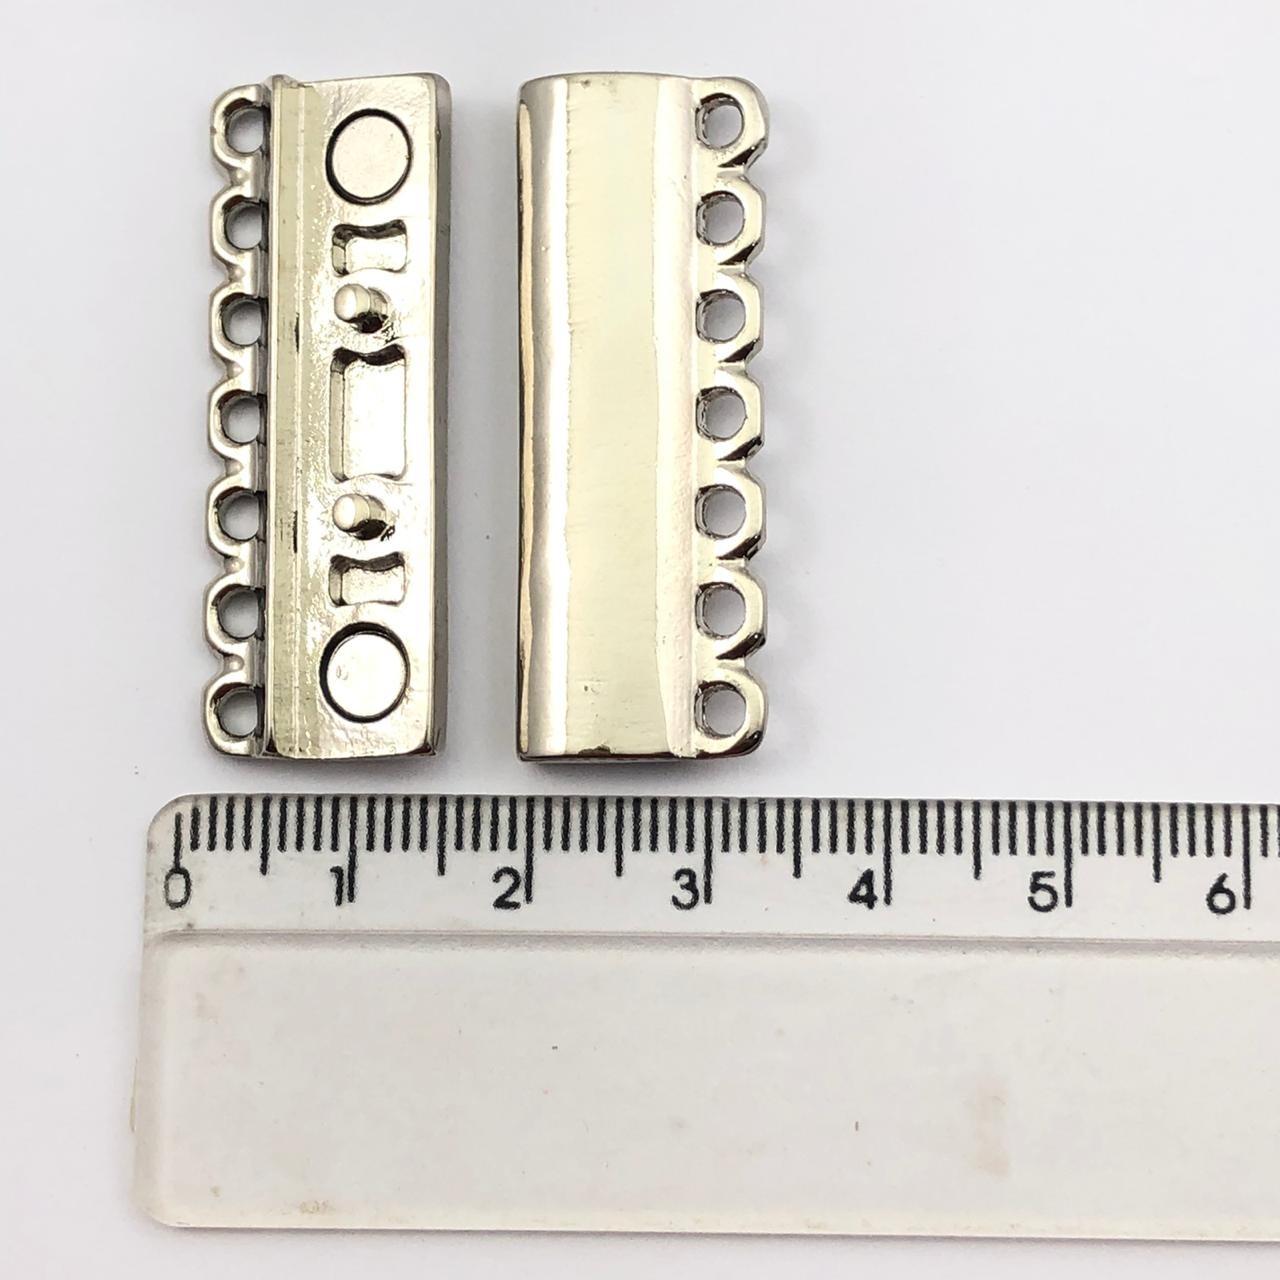 FC106 - Fecho Imã 7 Saídas Ródio Branco - 01Conjunto